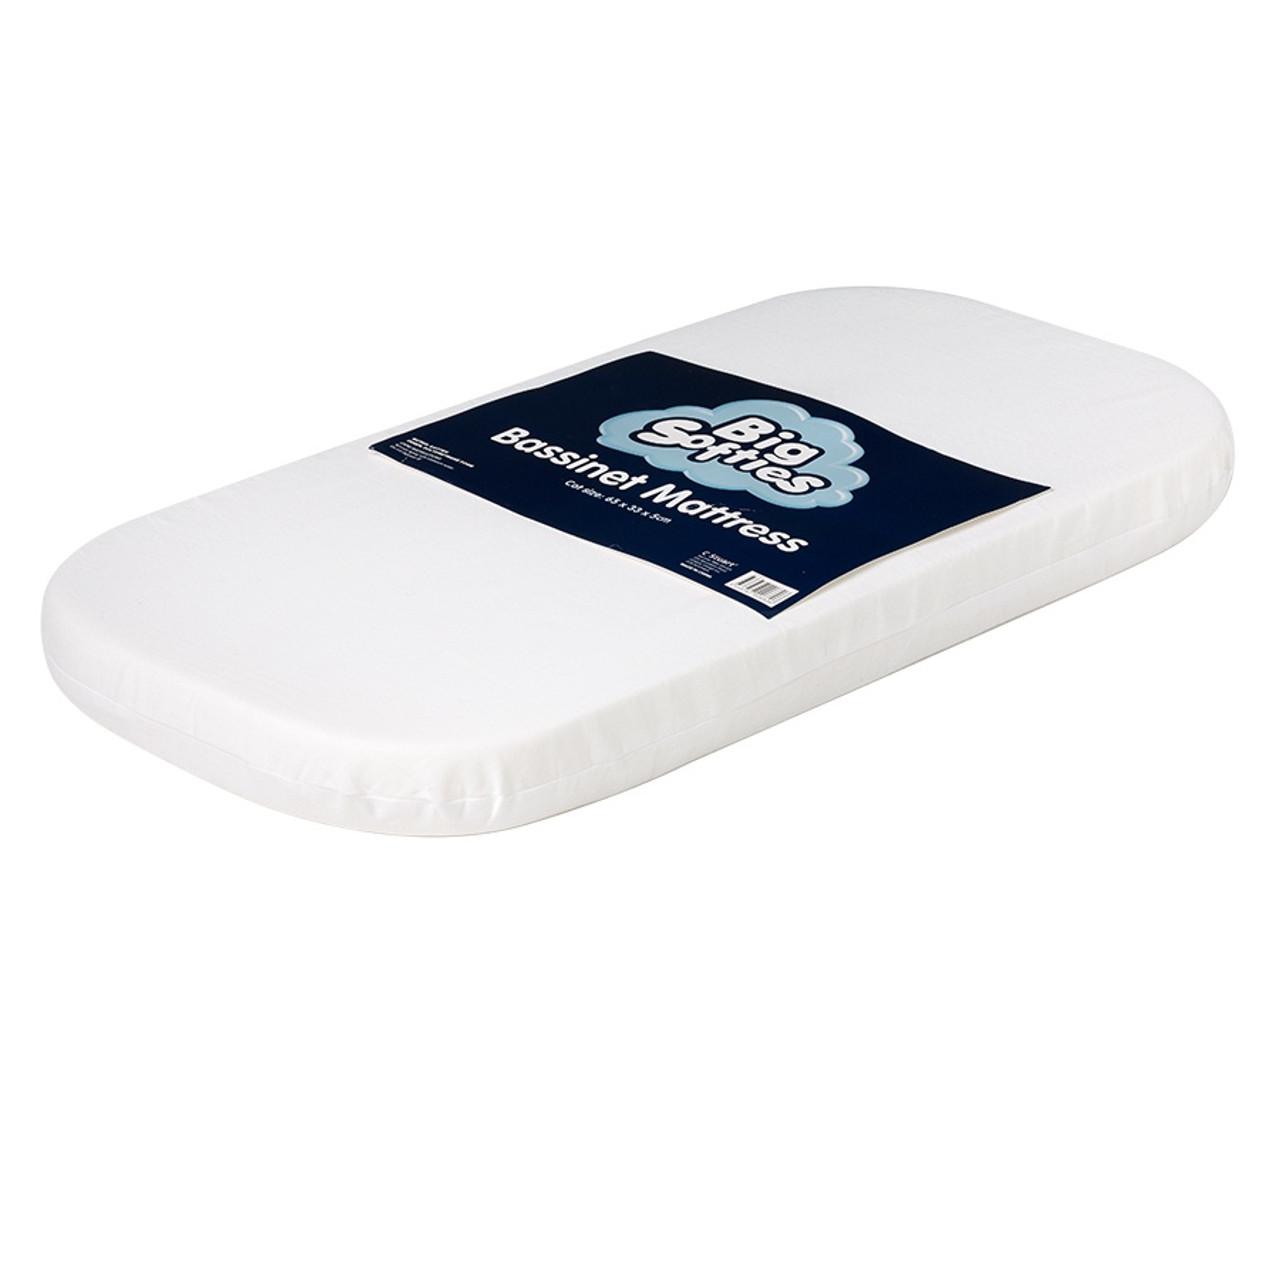 Big Softies Bassinet Mattress 65 x 33 cm at Baby Barn Discounts Big softies foam bassinet mattress in size 65 x 33 cm.